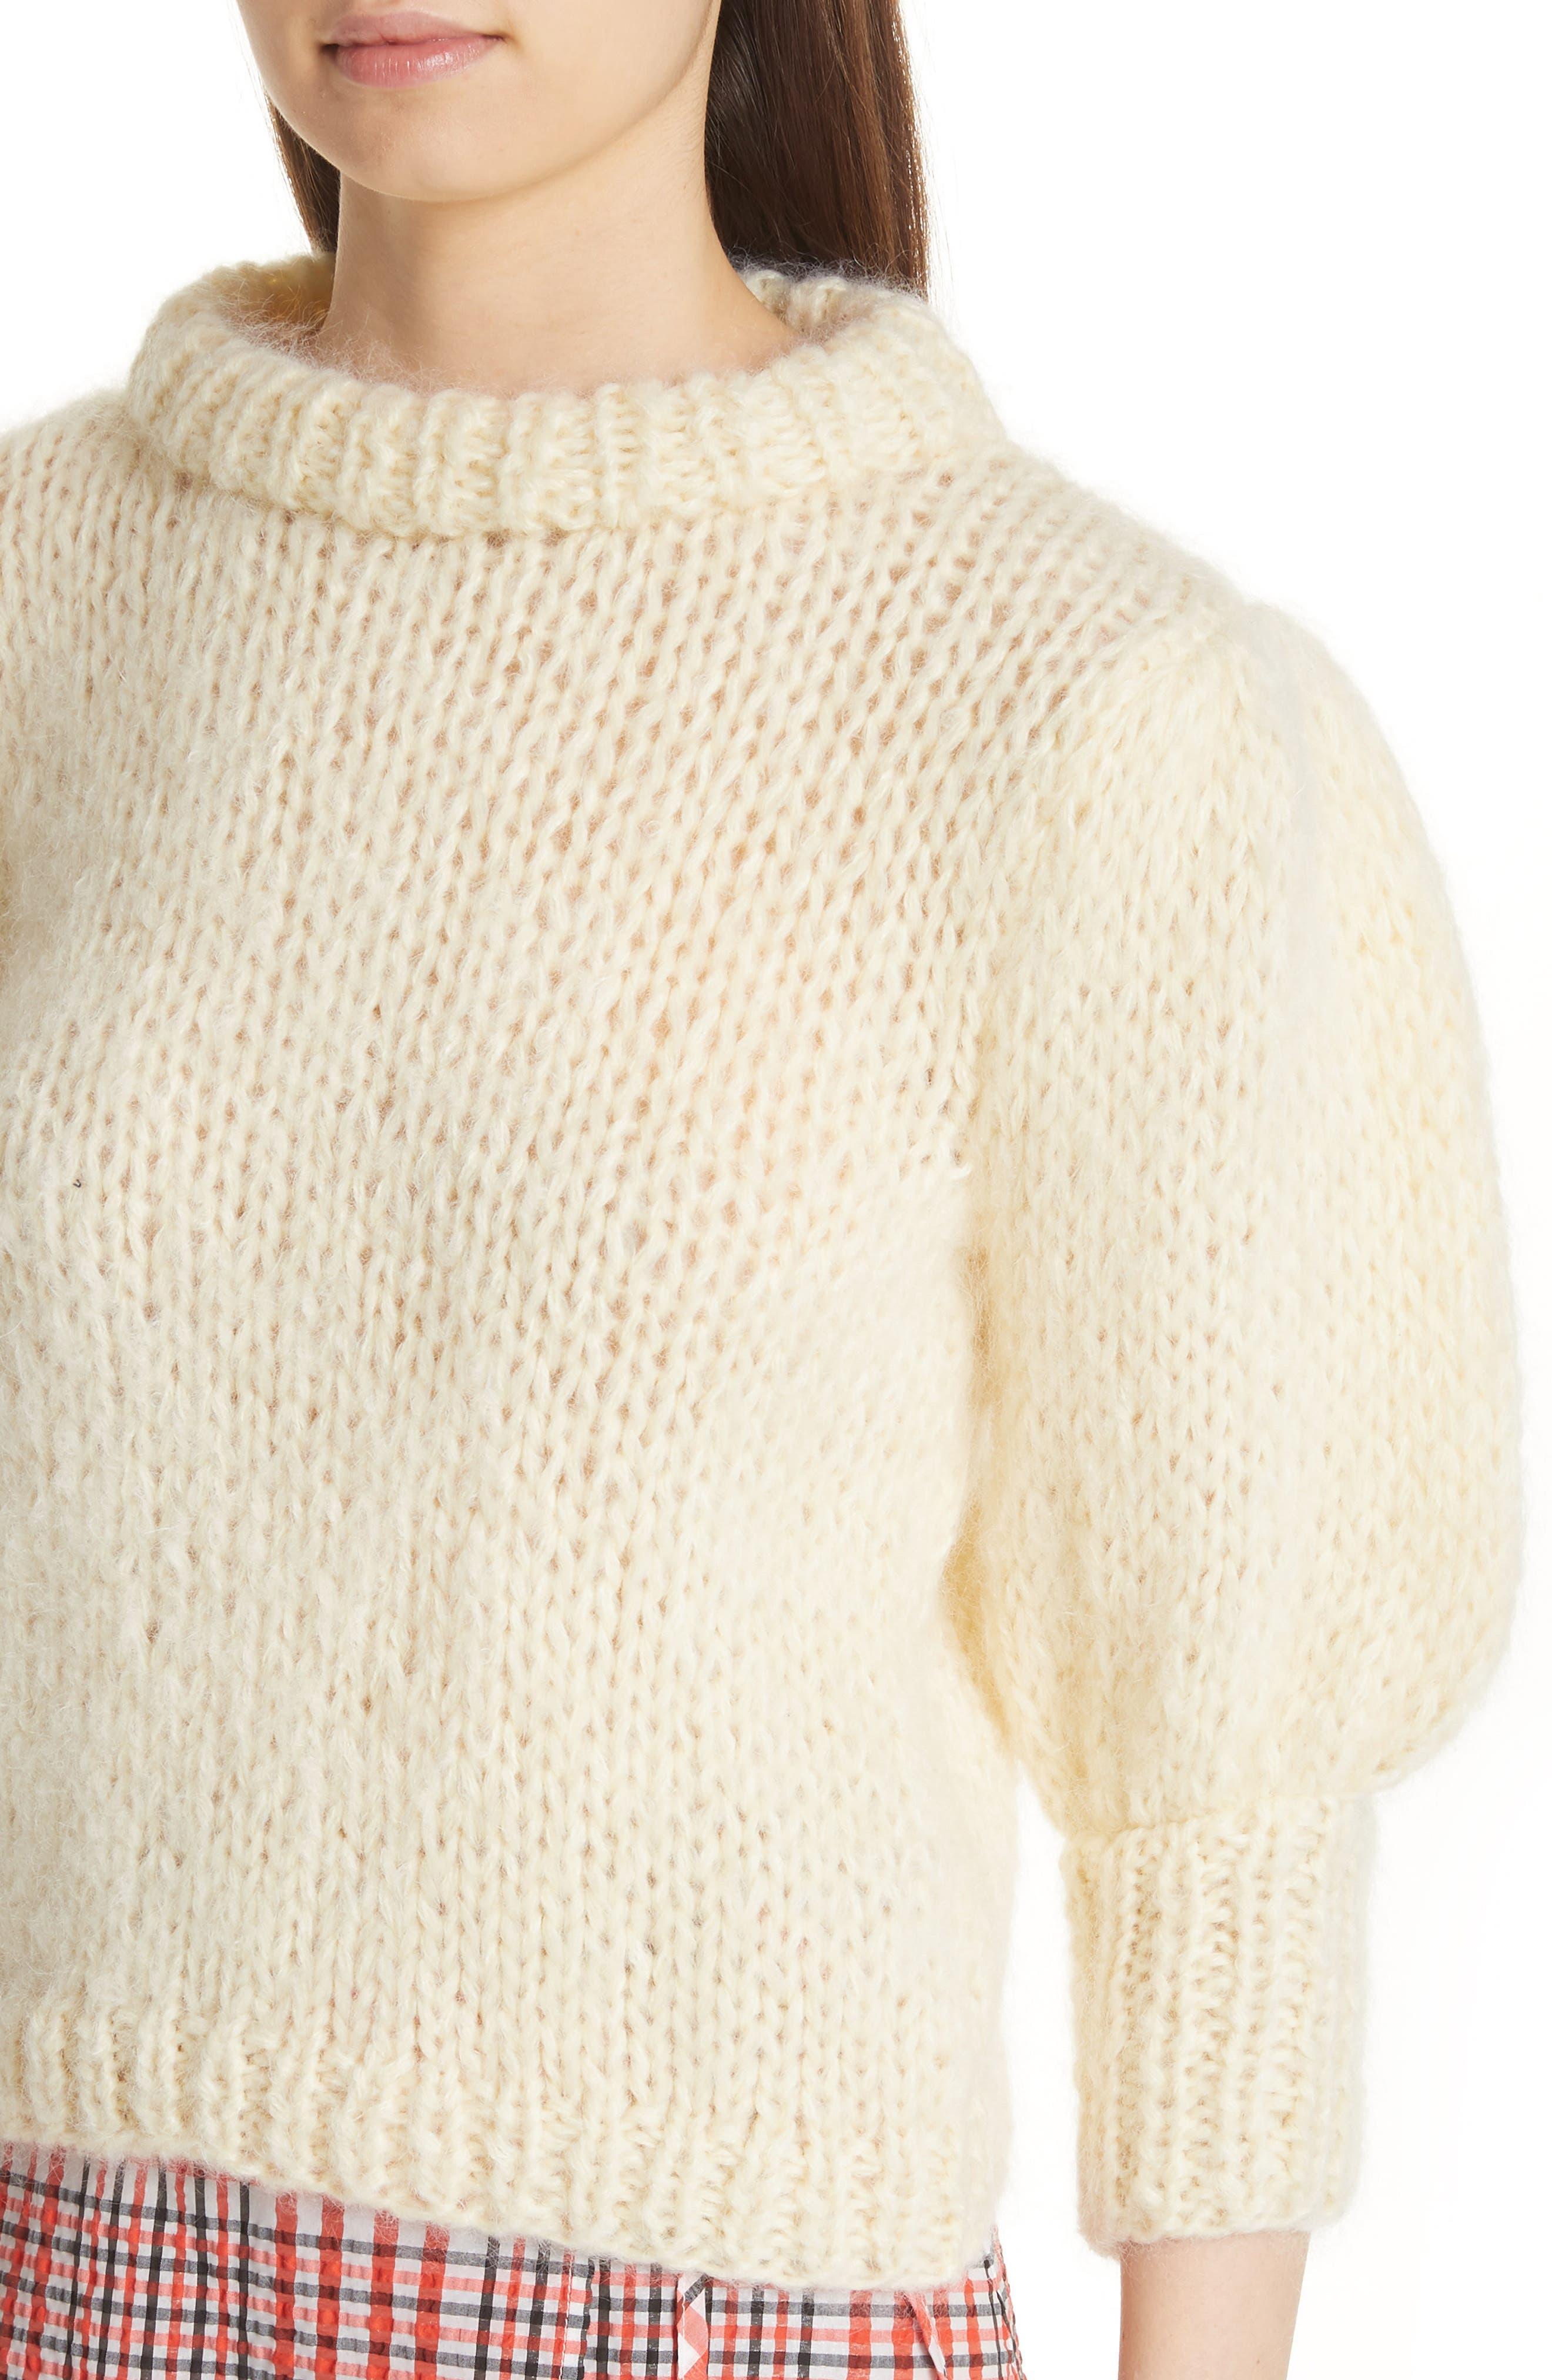 Juilliard Mohair & Wool Puff Sleeve Sweater,                             Alternate thumbnail 4, color,                             900